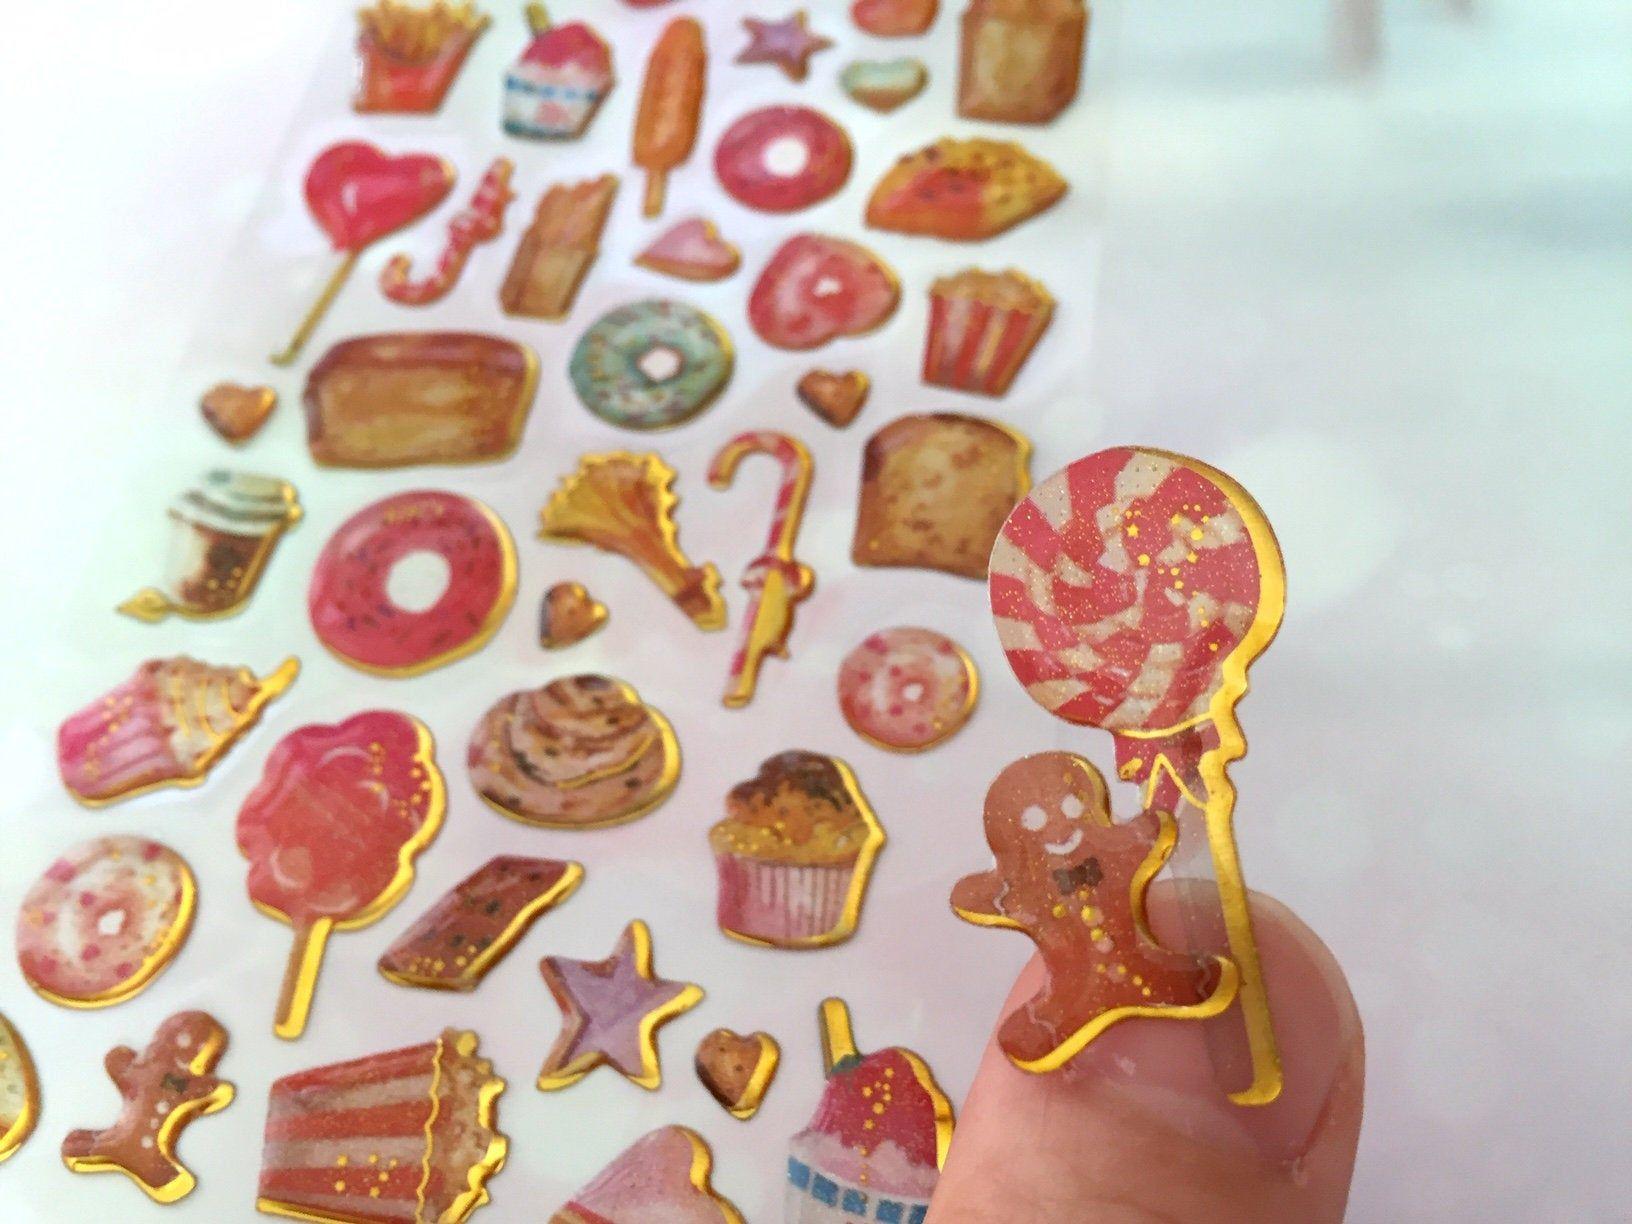 baking theme sticker cupcake donut Birthday cake